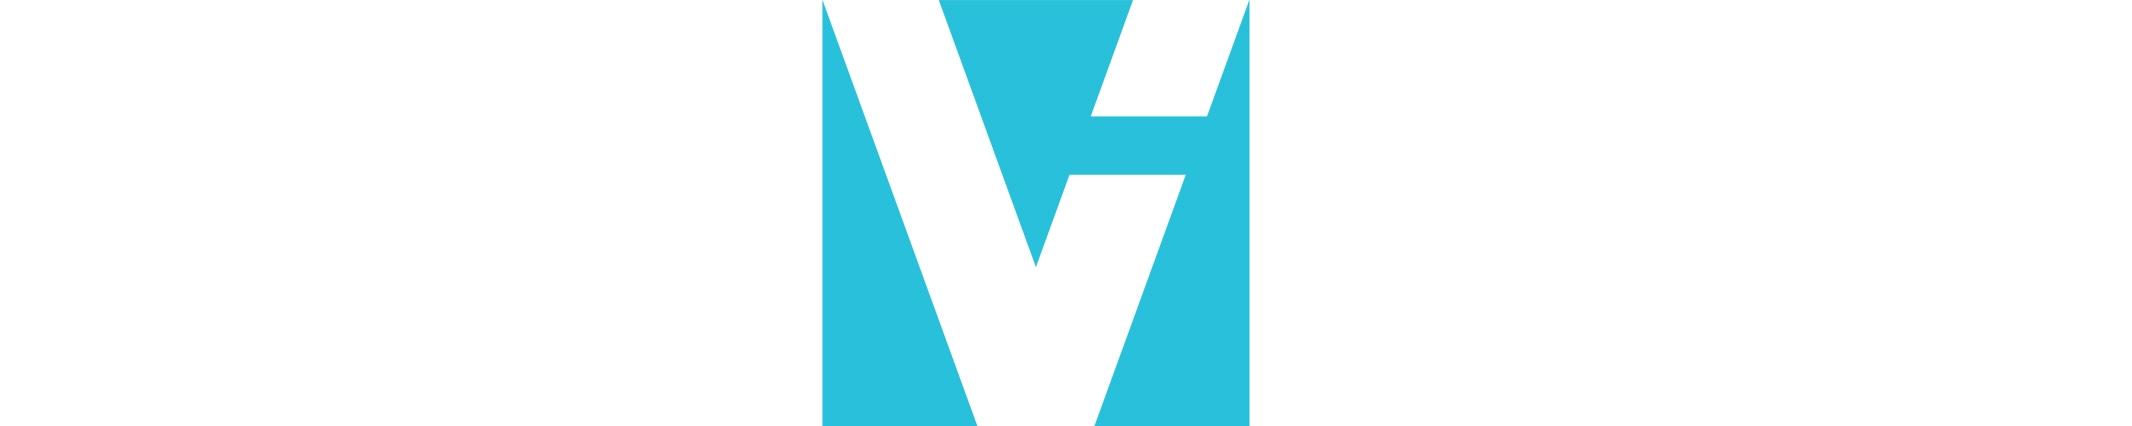 Regulamin firmy Visual Image